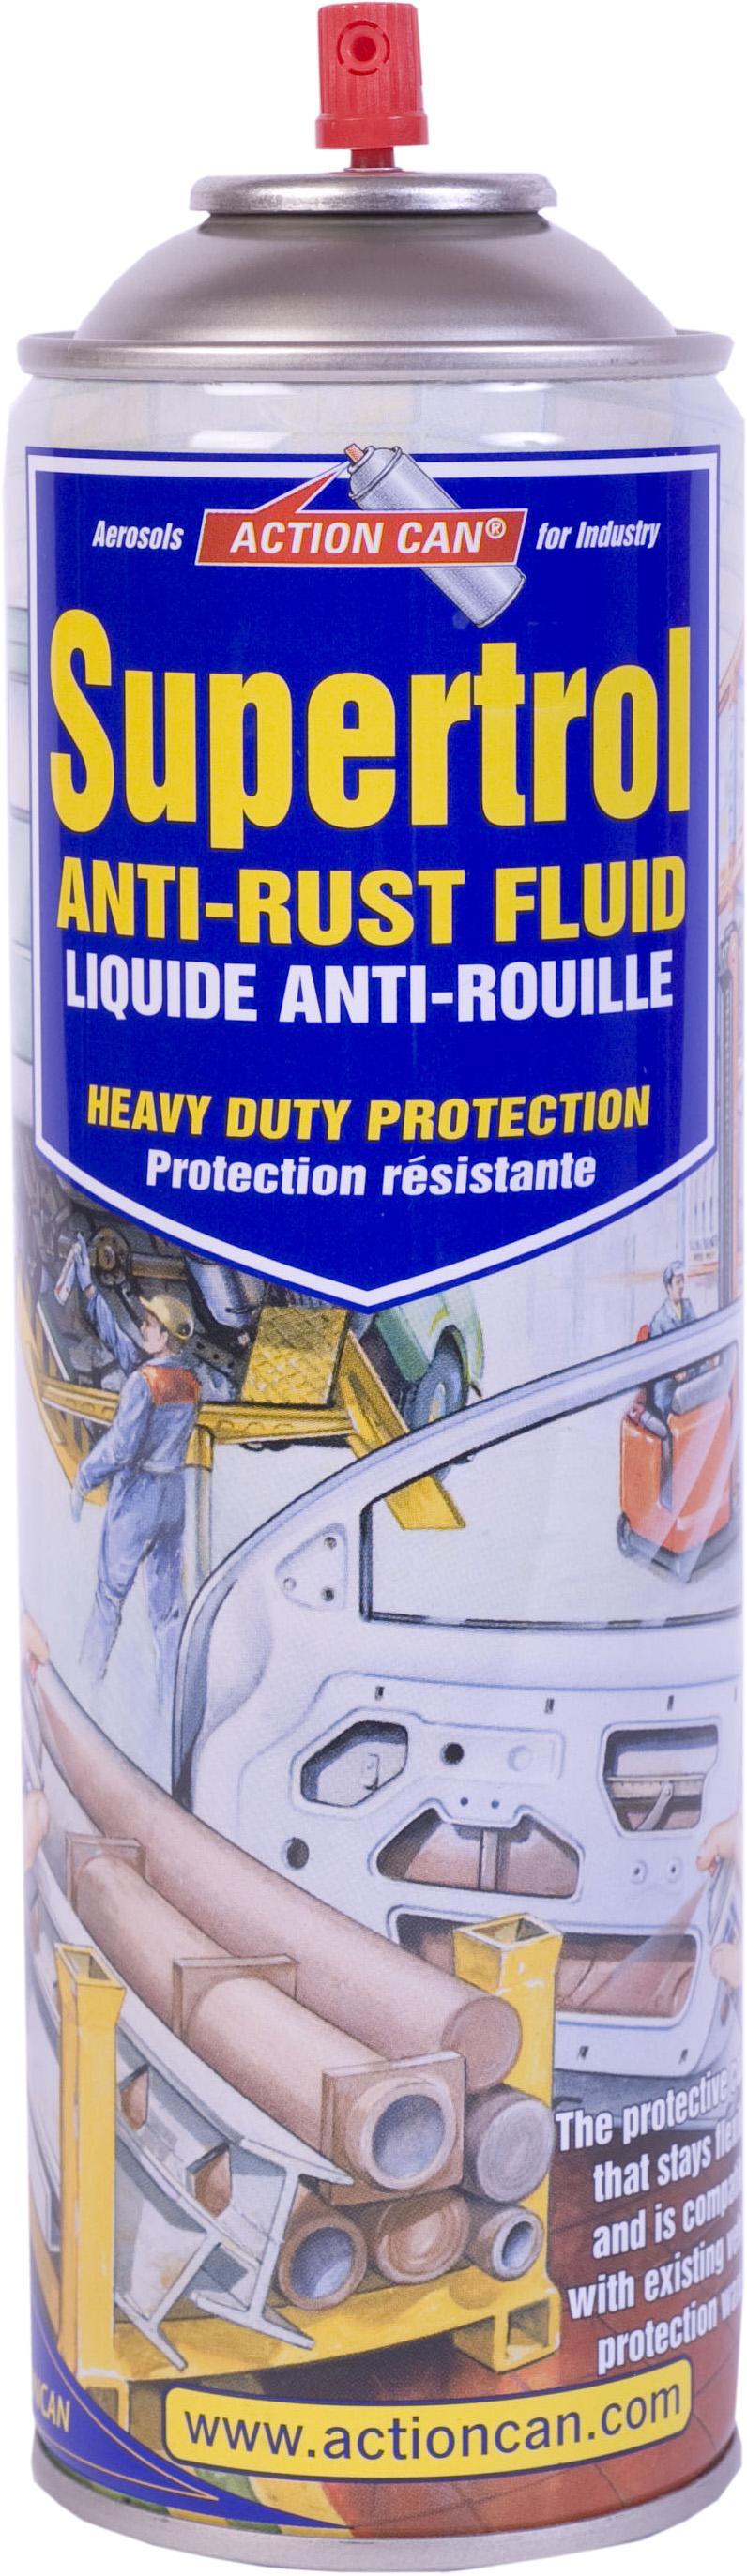 Supertrol ACT1947 Supertrol Anti Rust Fluid